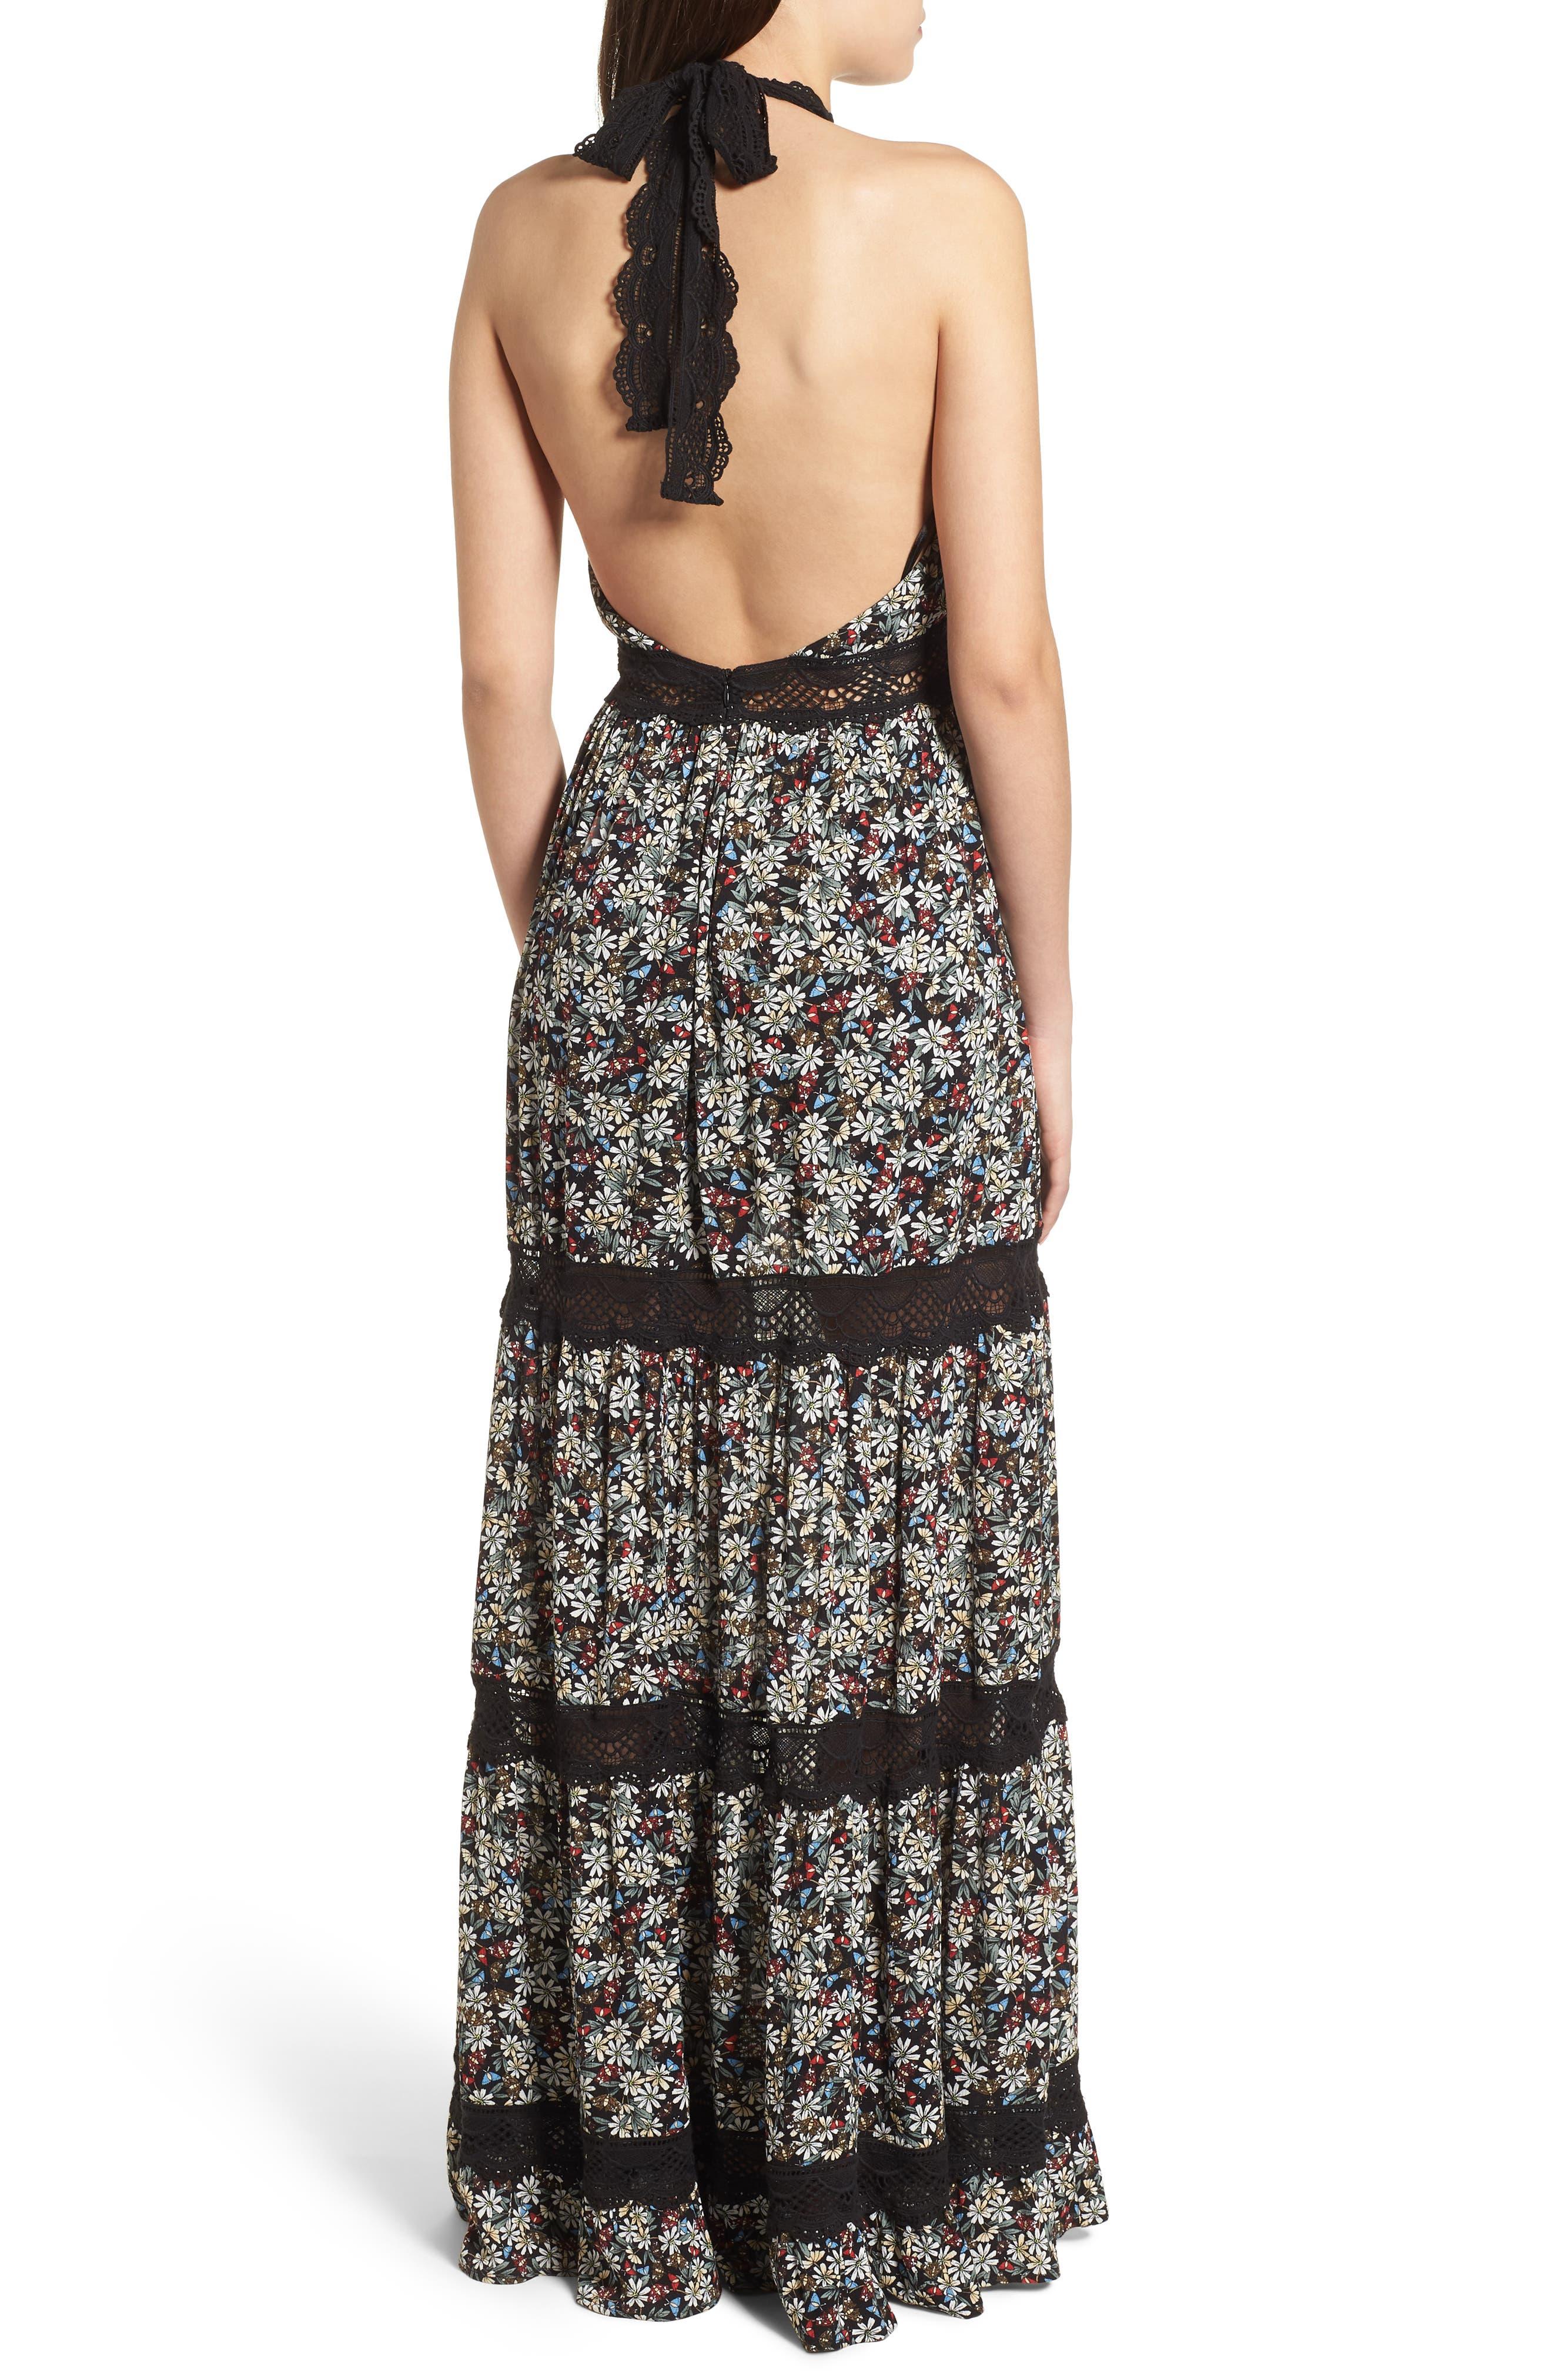 Flora Halter Neck Maxi Dress,                             Alternate thumbnail 2, color,                             004